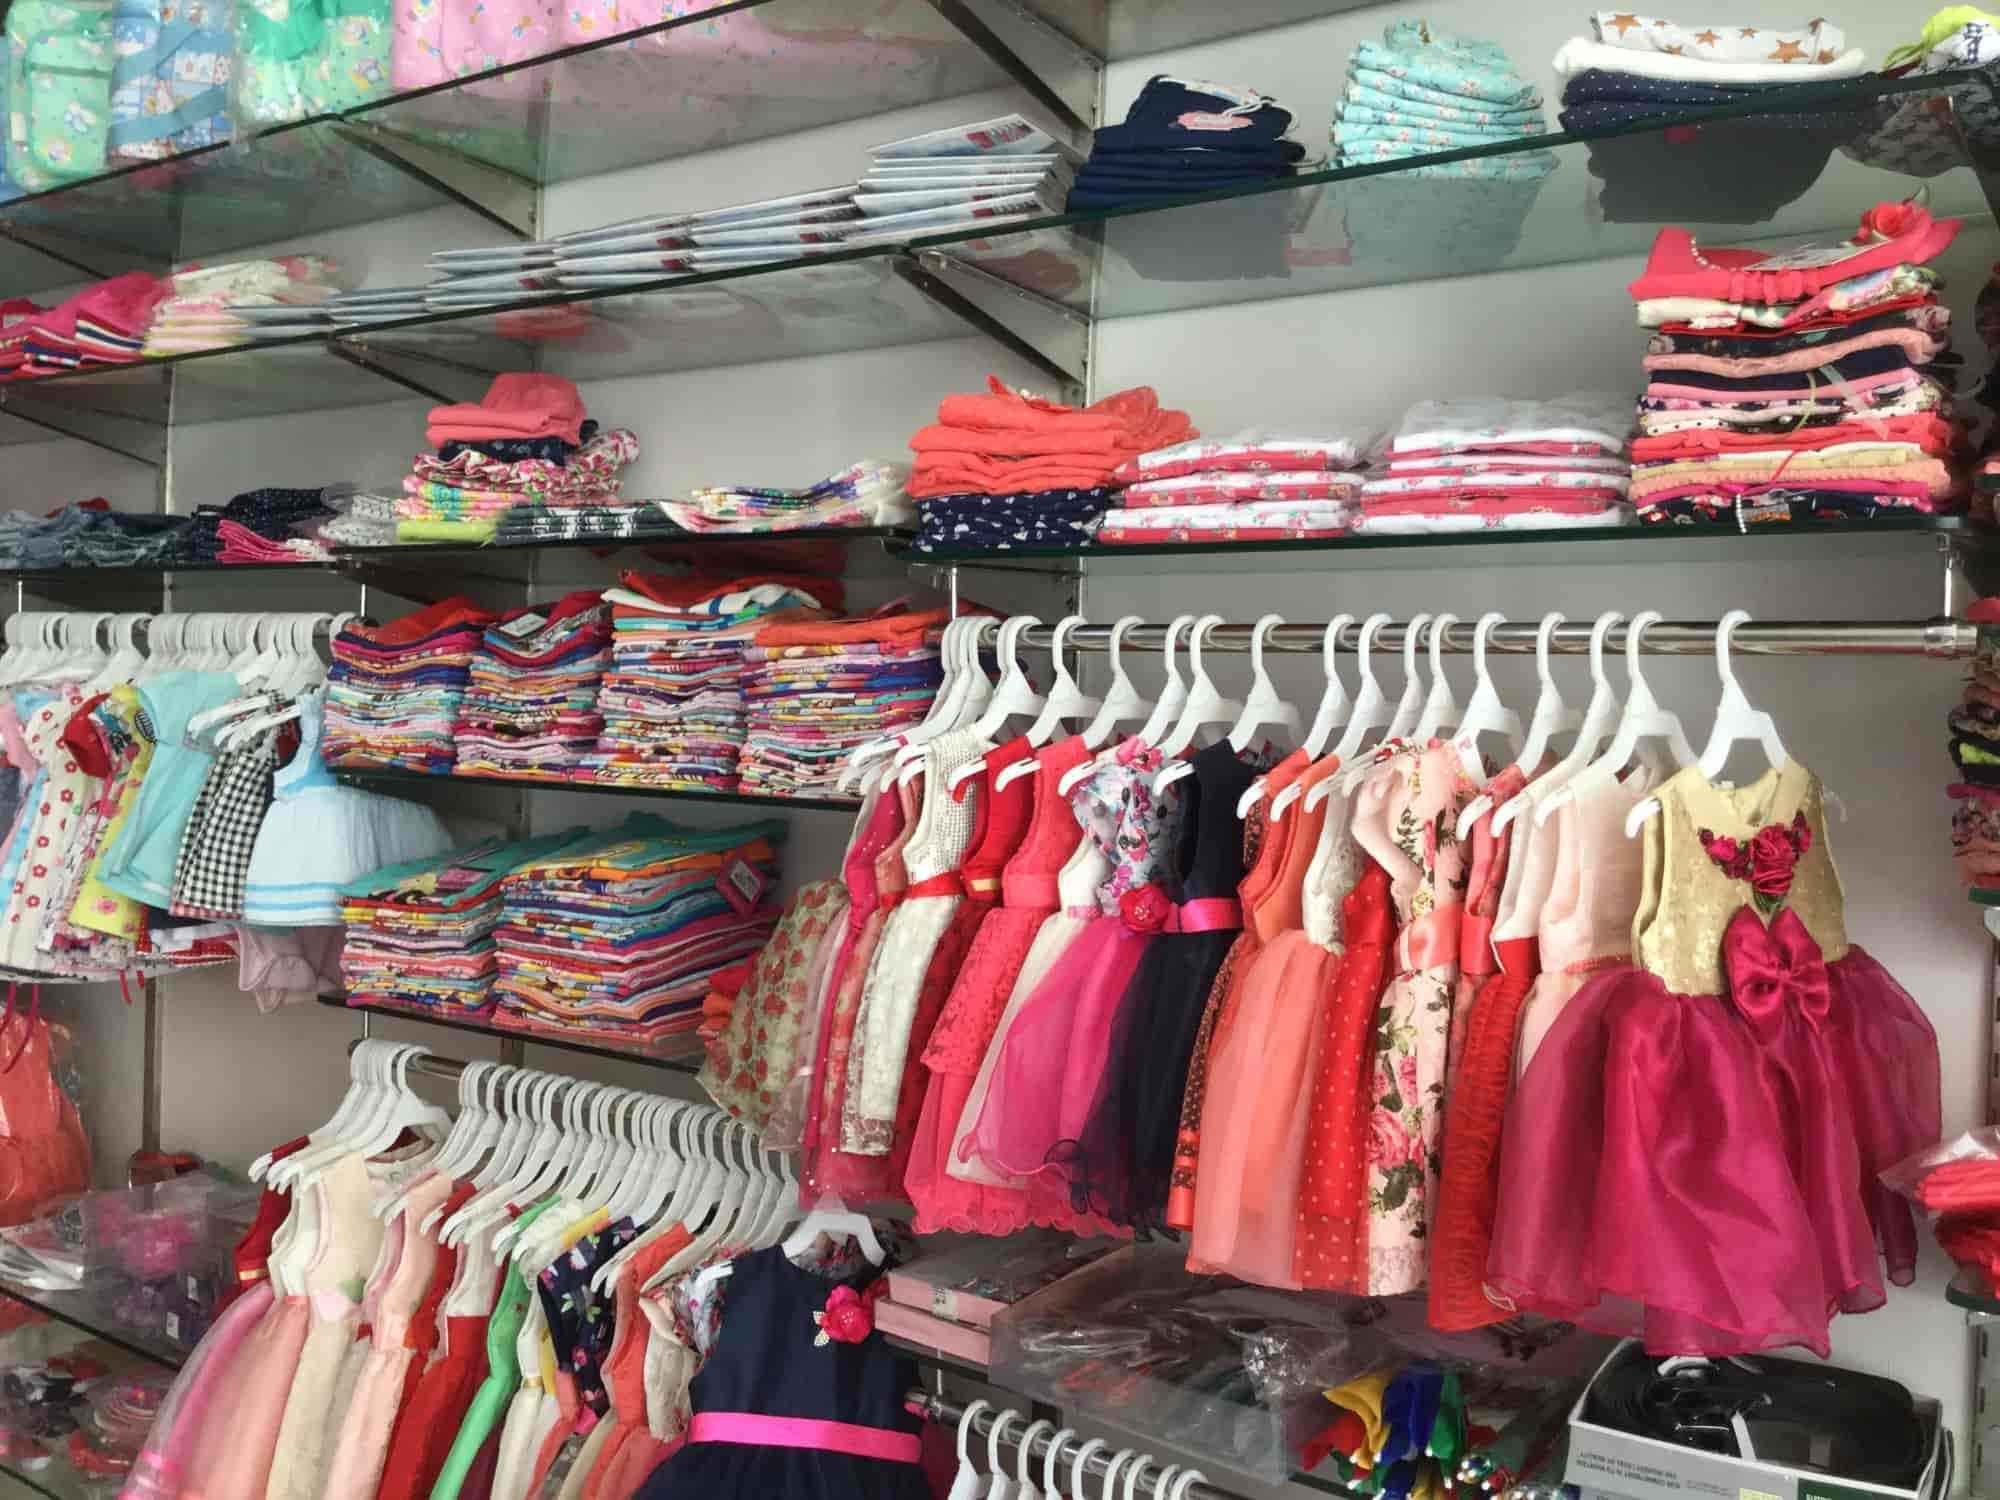 c93d3b7f3 Petals Childrens Wear, Durgapura - Children Readymade Garment Retailers in  Jaipur - Justdial